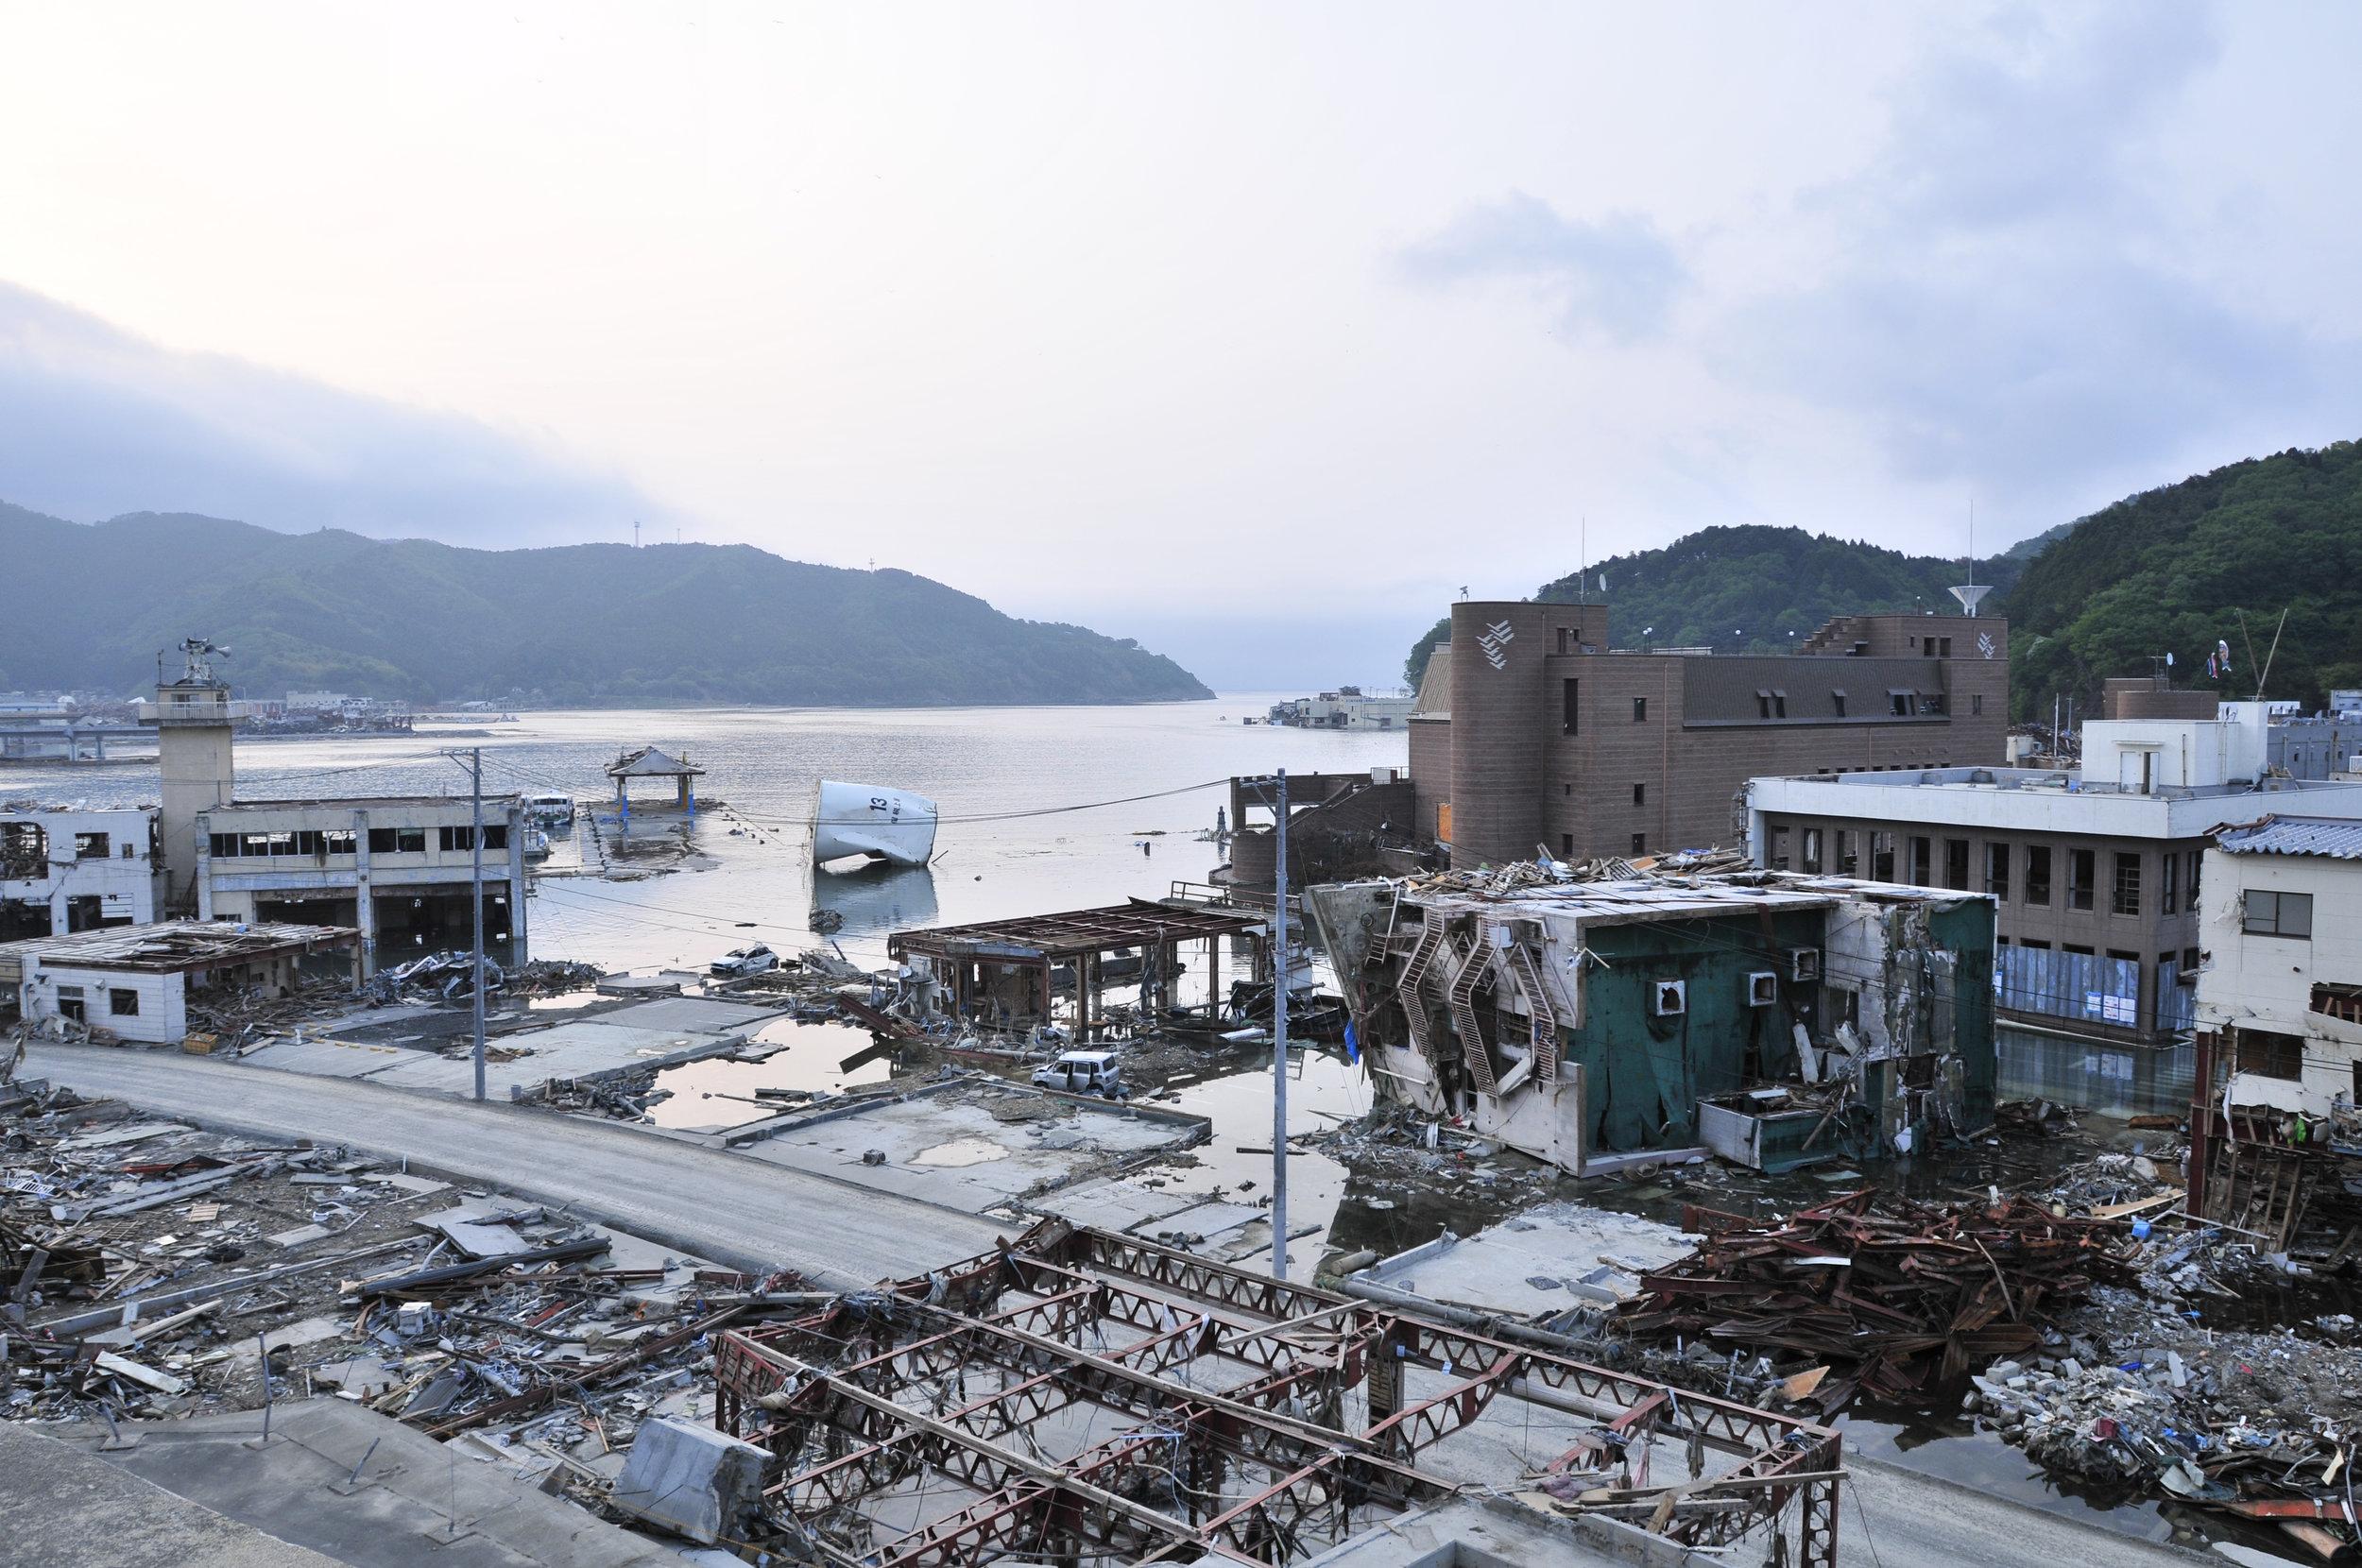 Destruction in Sendai, March 11 2011.